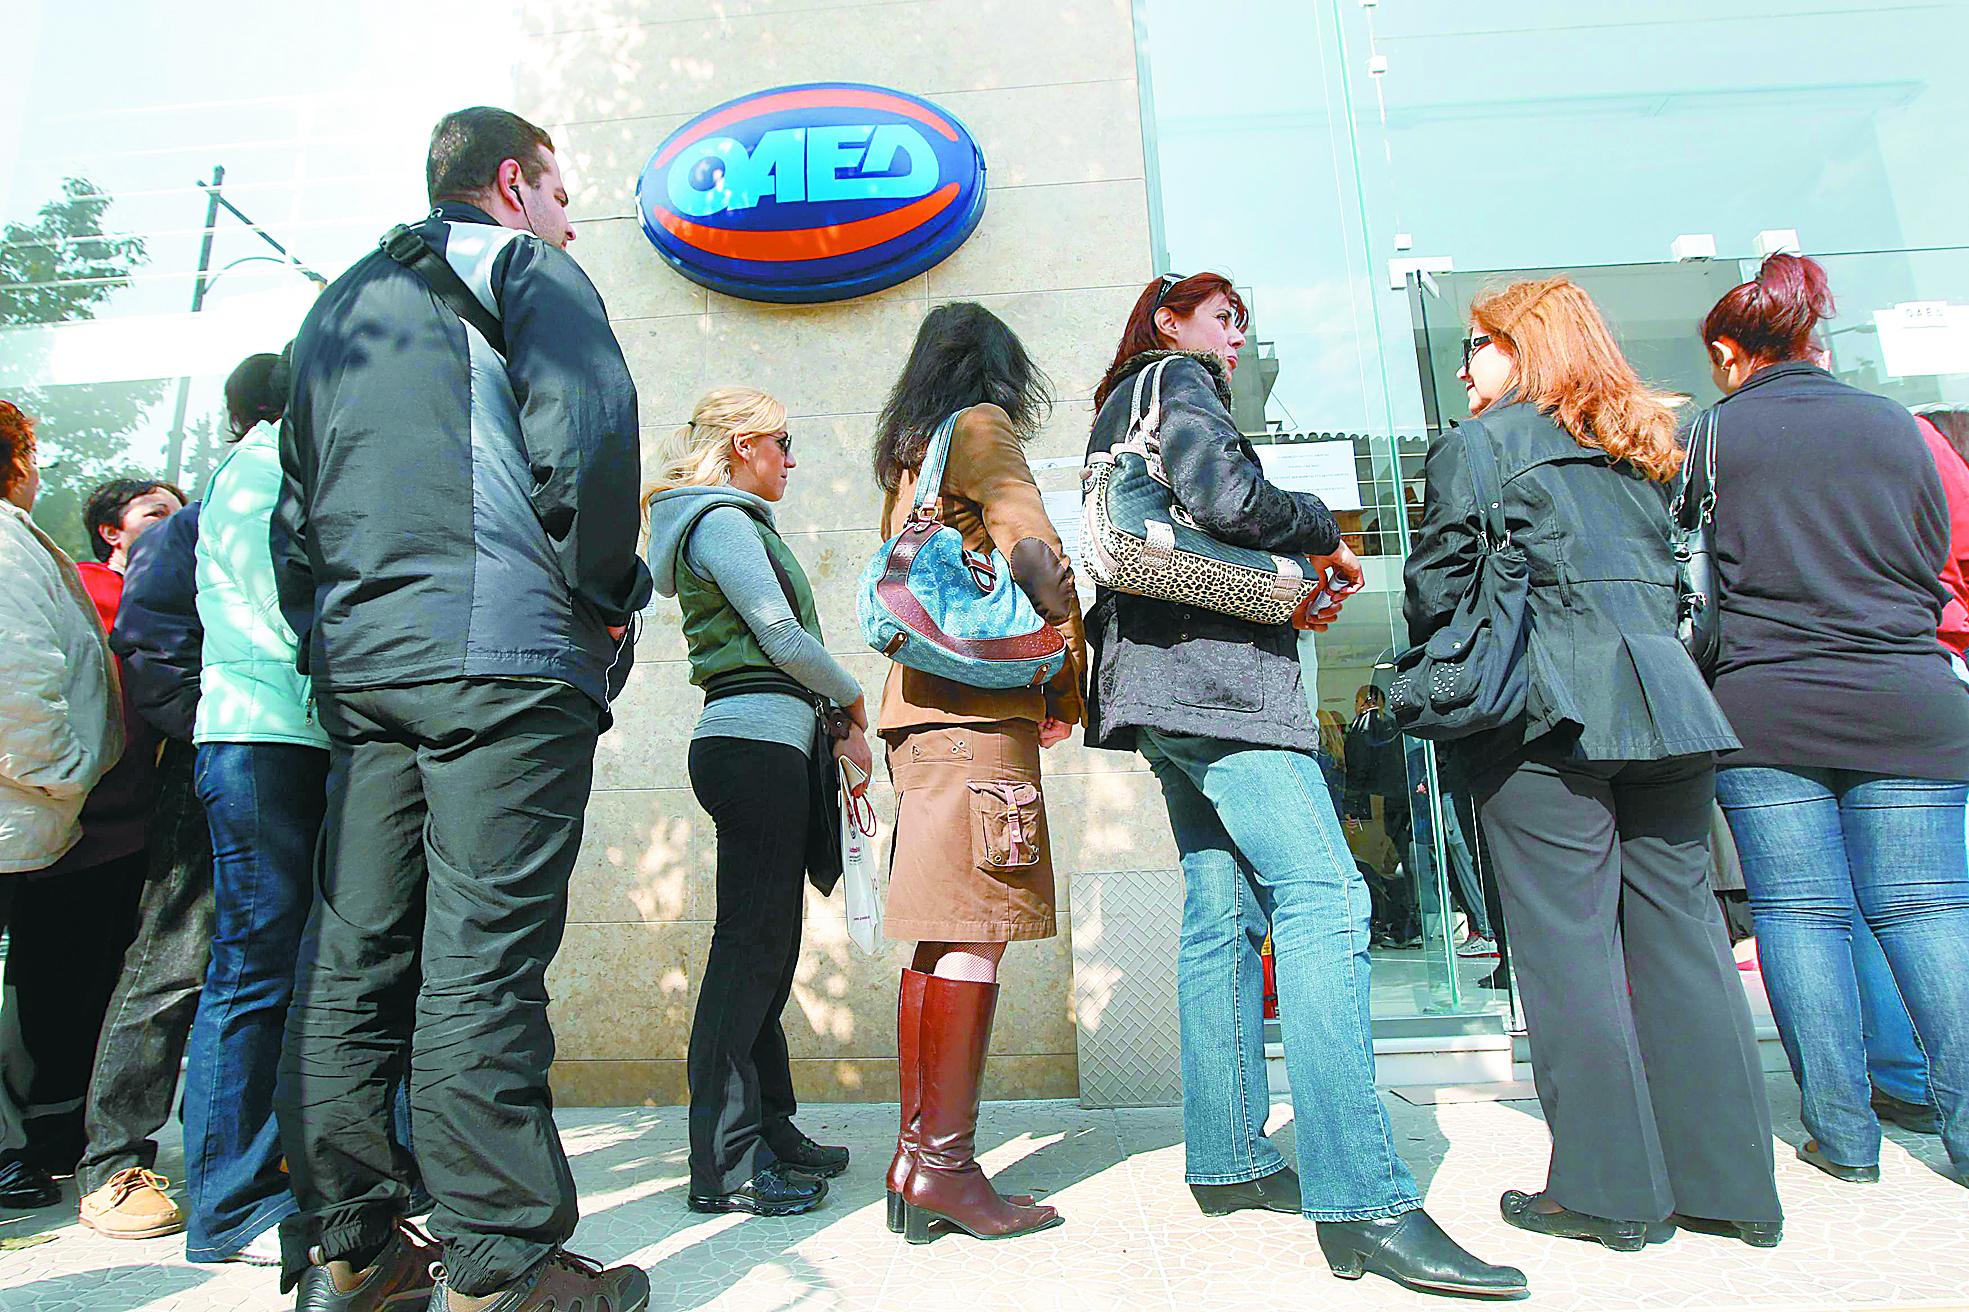 Eurostat: Αύξηση 50% της ανεργίας στους νέους την τελευταία πενταετία | tovima.gr